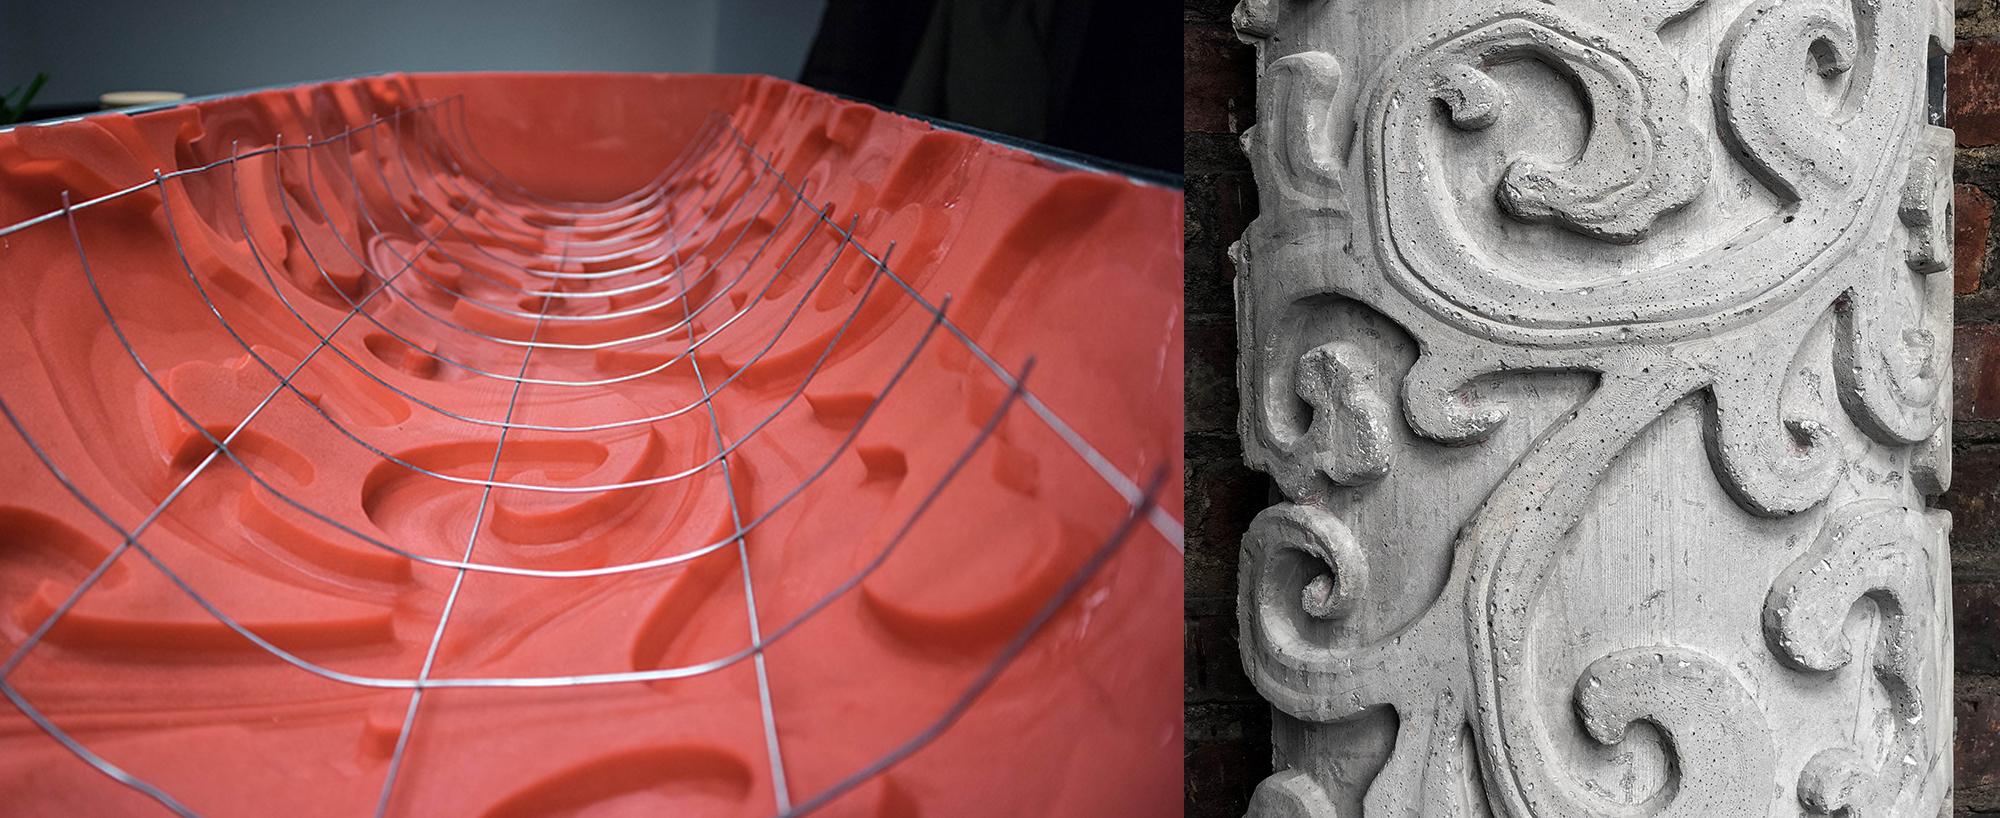 A mold 3D printed by EDG, to produce the column on the right. Photos via EGD.